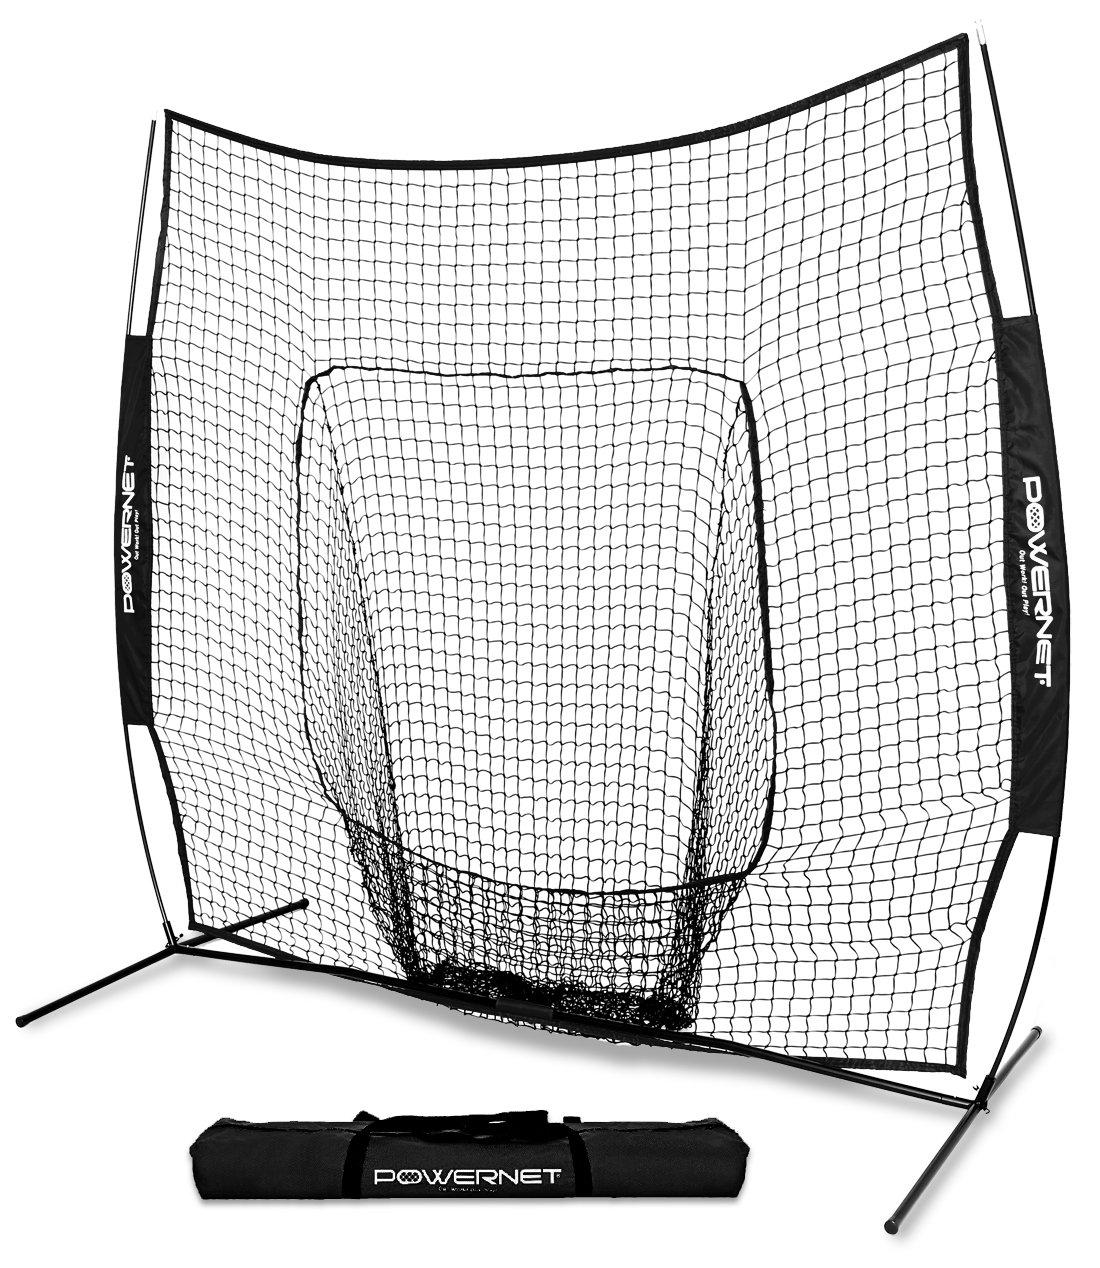 PowerNet Team Color Baseball Softball 7x7 Hitting Net w/Bow Frame (Black) by PowerNet